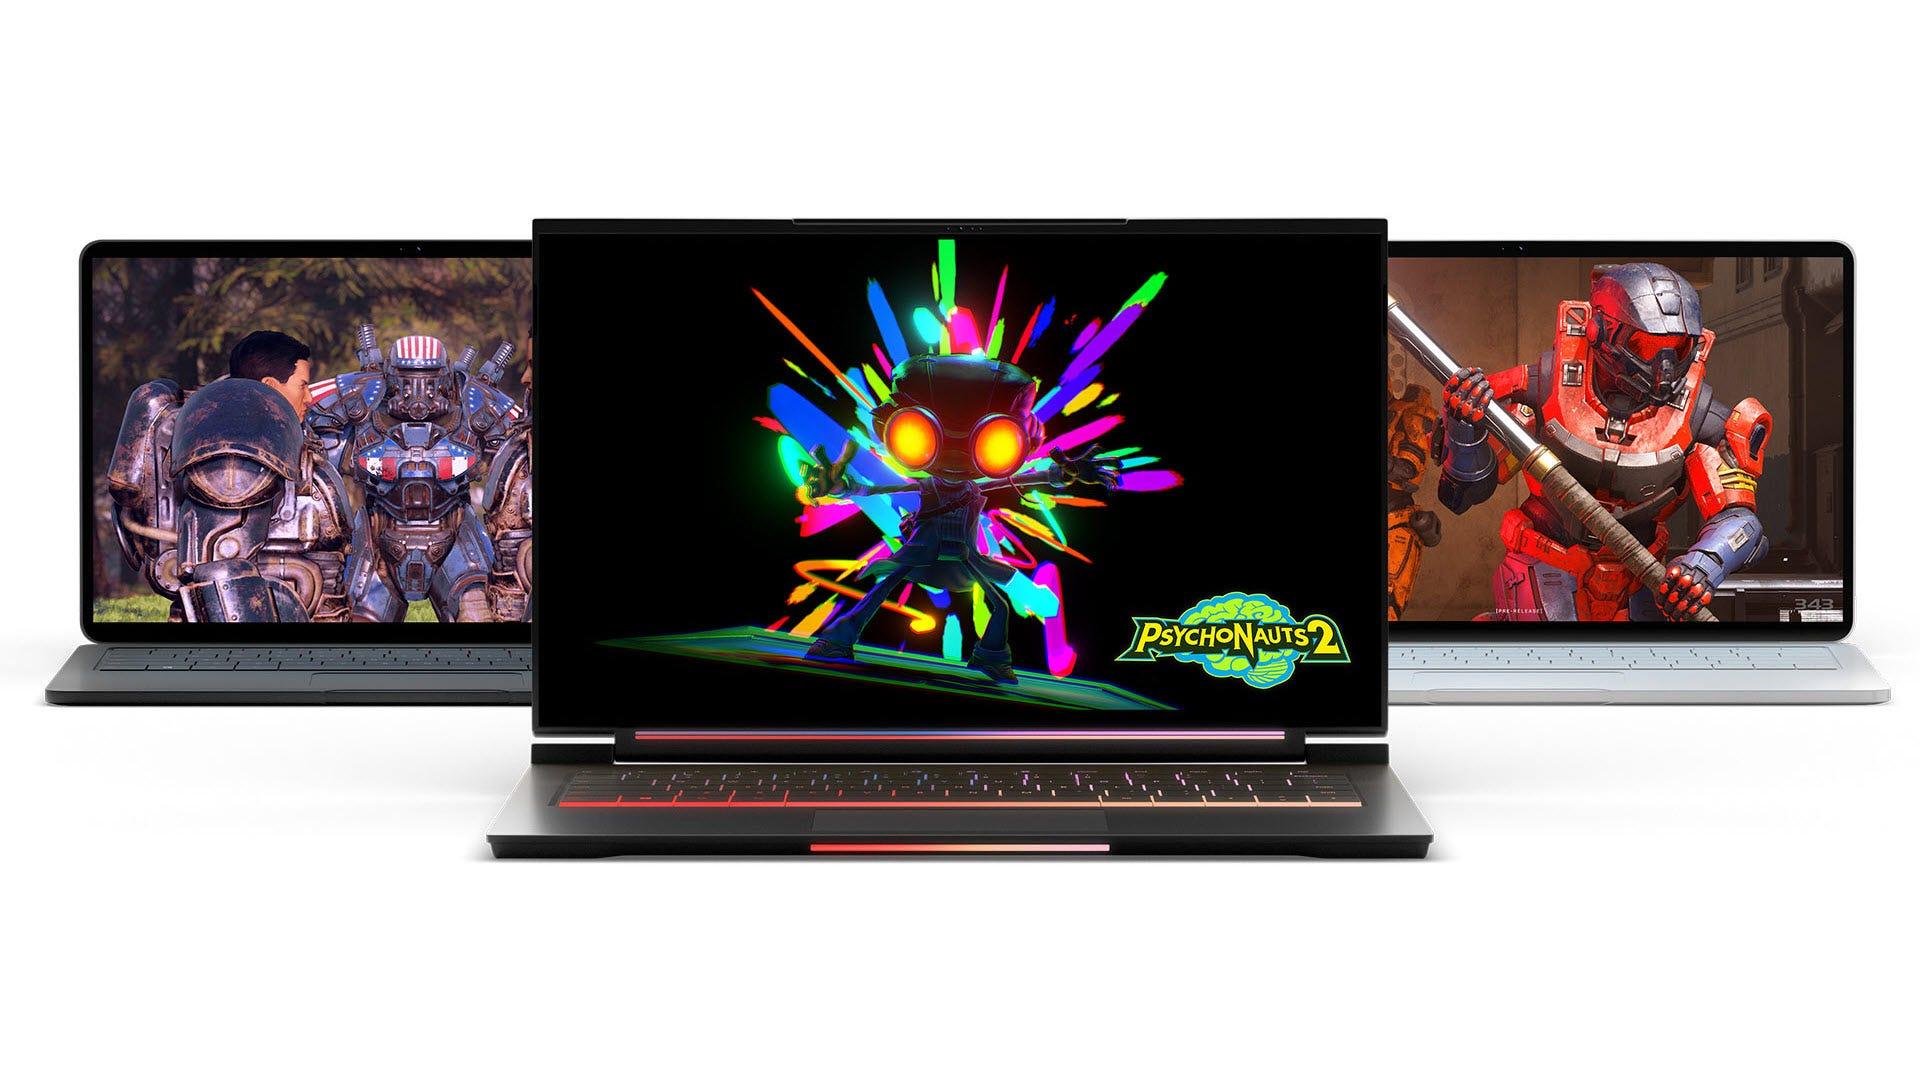 Three laptops playing PC games